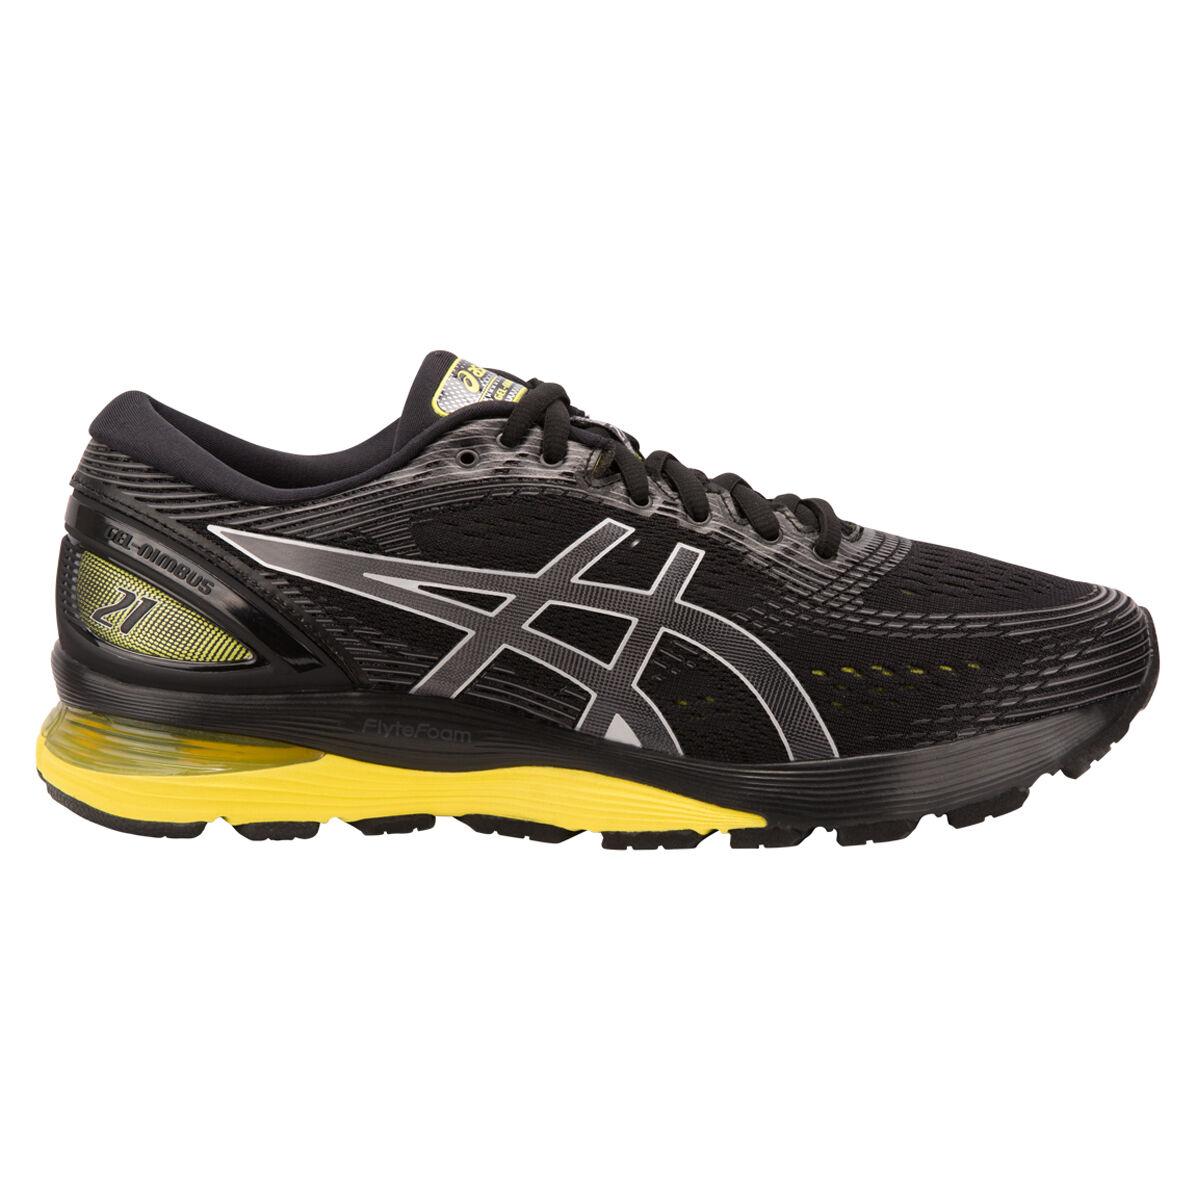 Asics Mens GEL Nimbus 21 Running Shoes